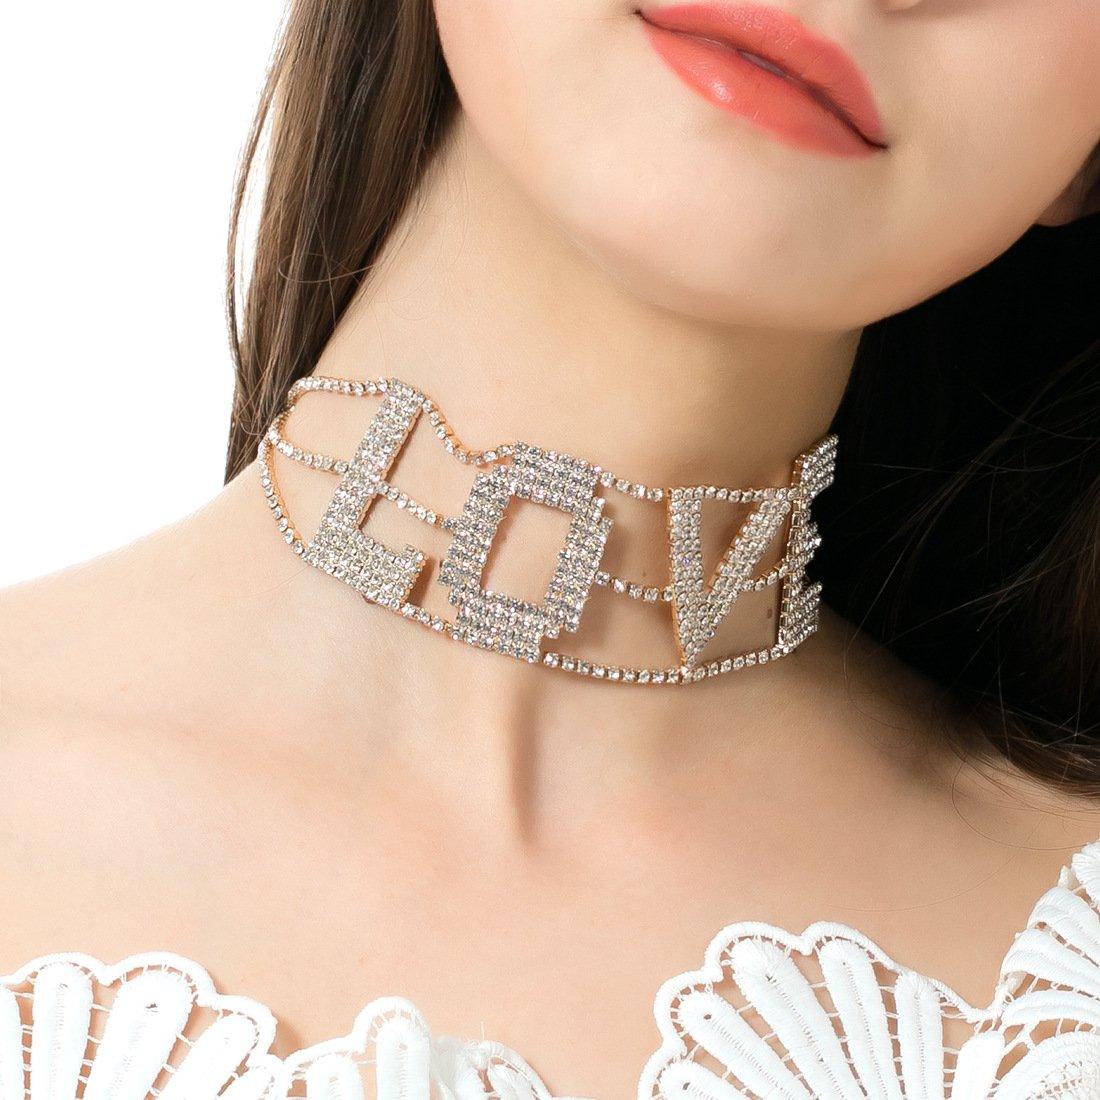 MengPa Rhinestone Choker Necklace for Women Fashion Letter Love Collar Wedding Jewelry Gold by MengPa (Image #3)